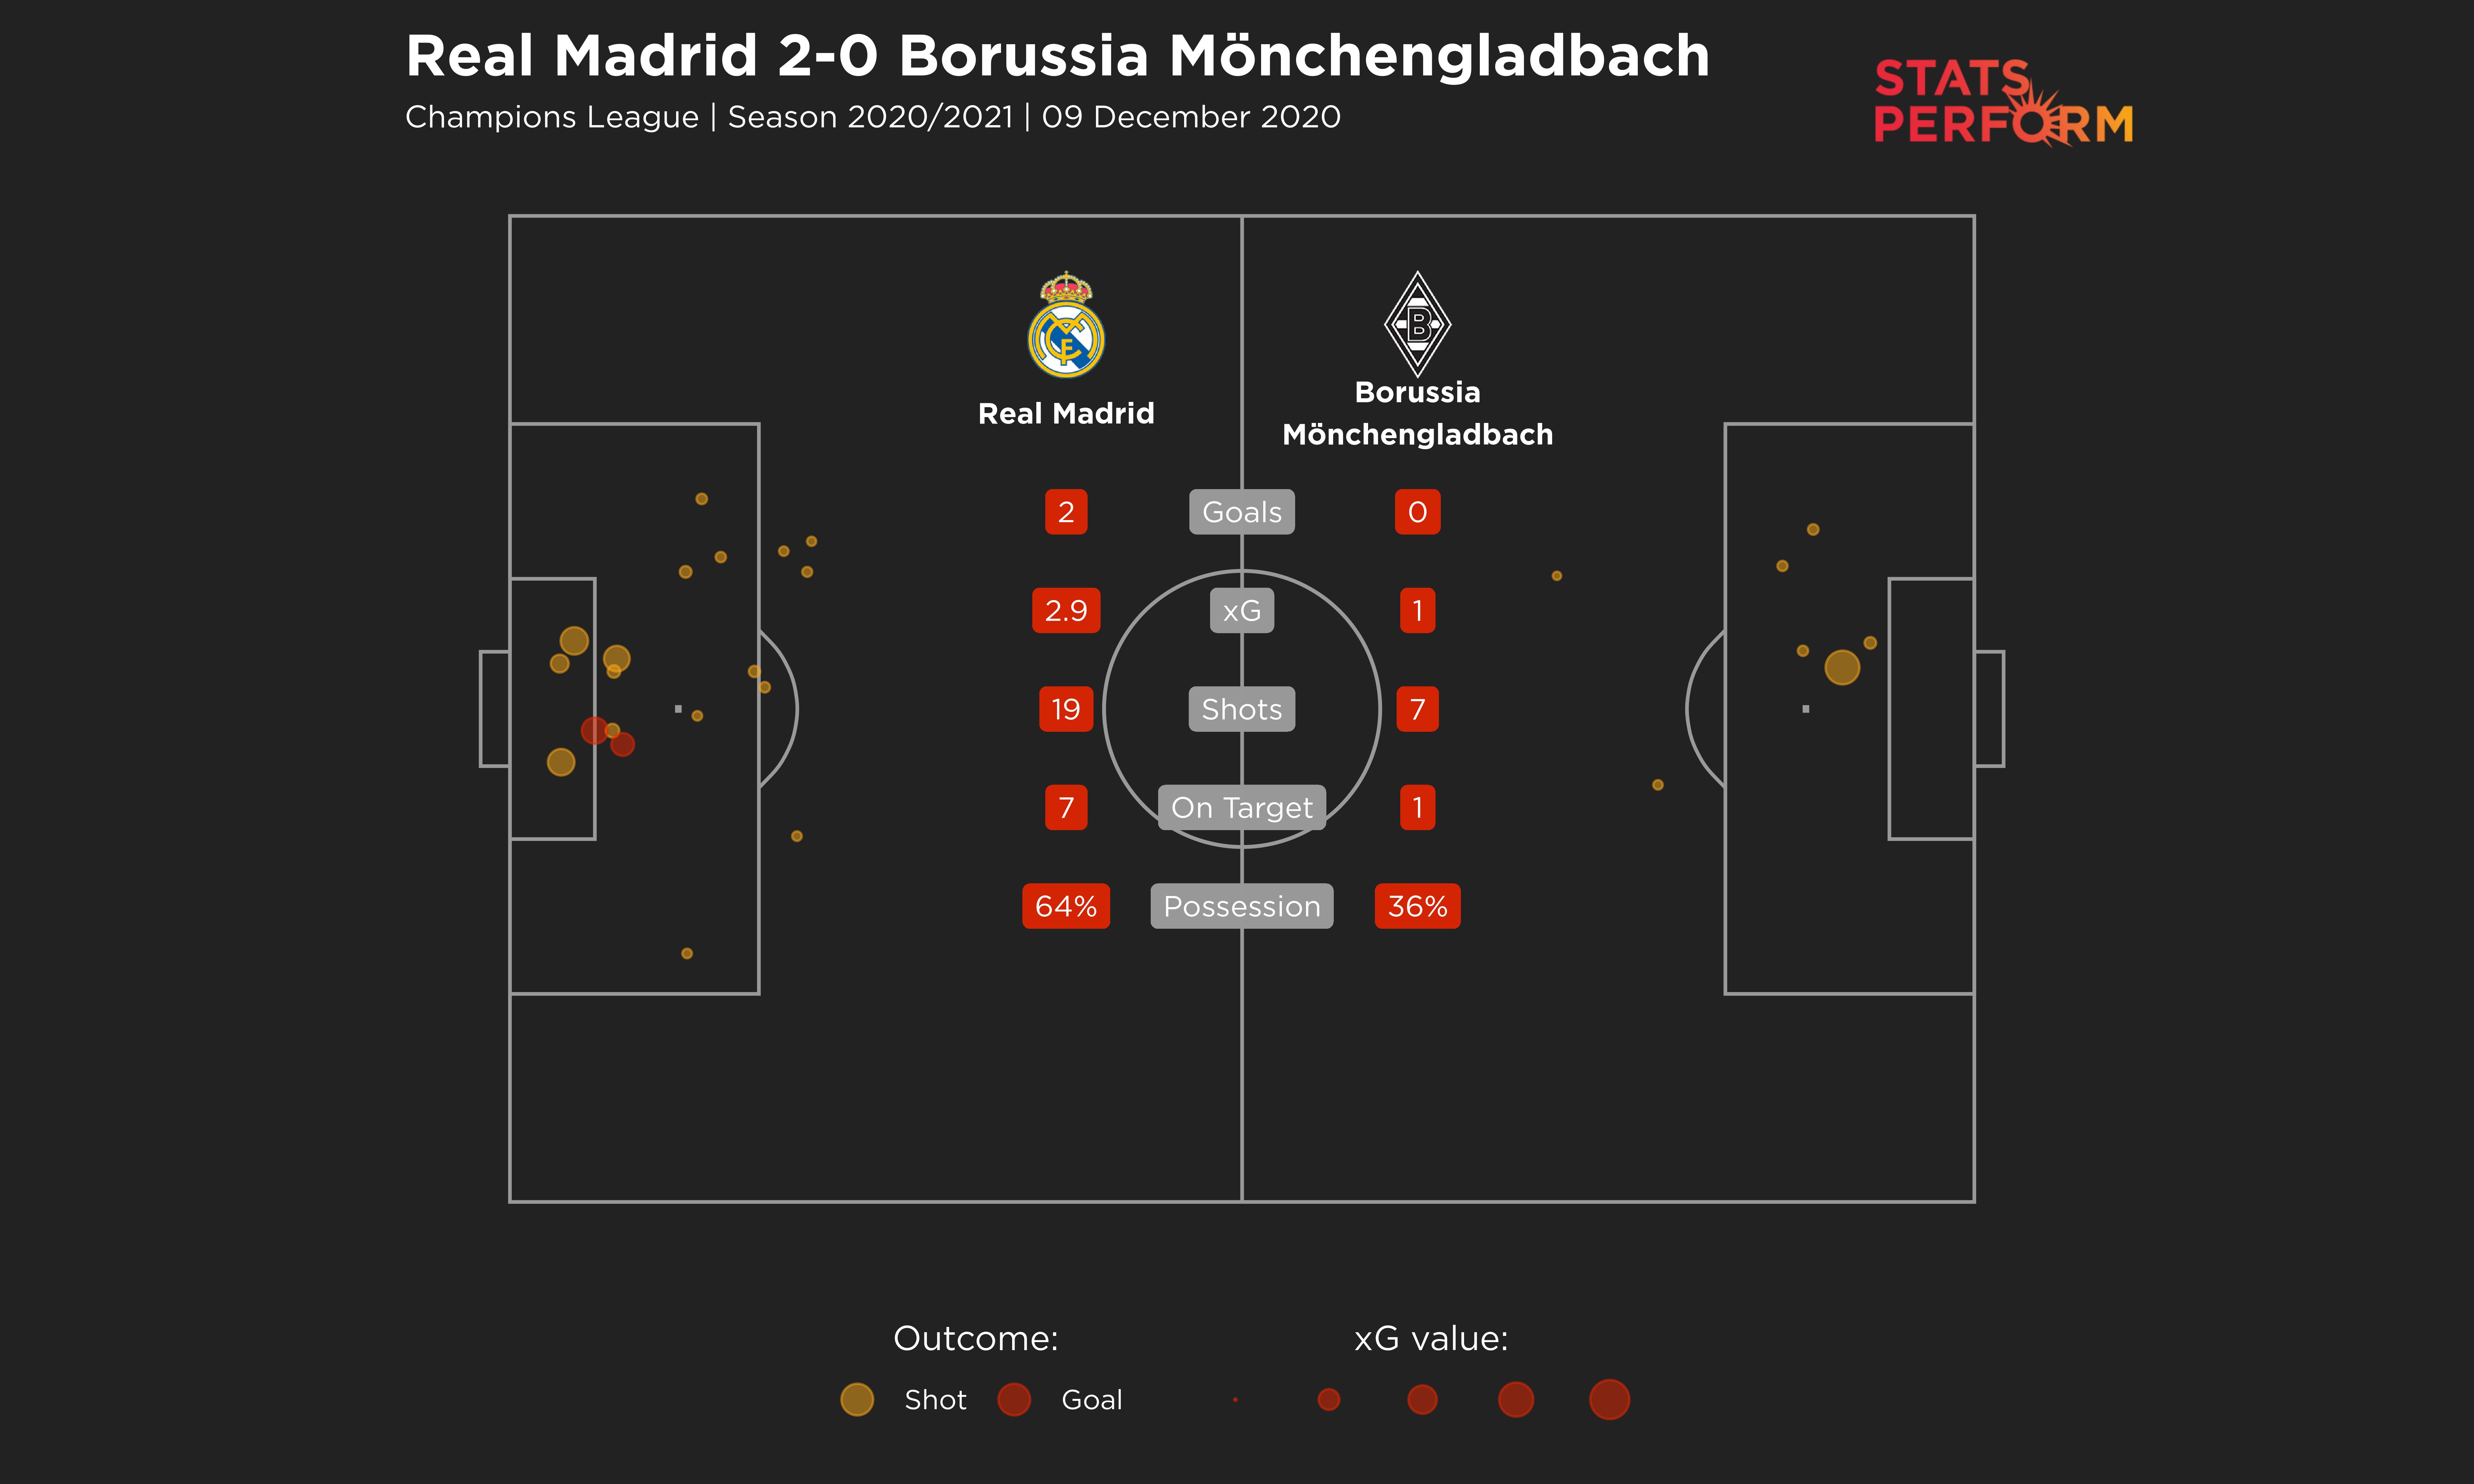 Real Madrid v Borussia Monchengladbach shots